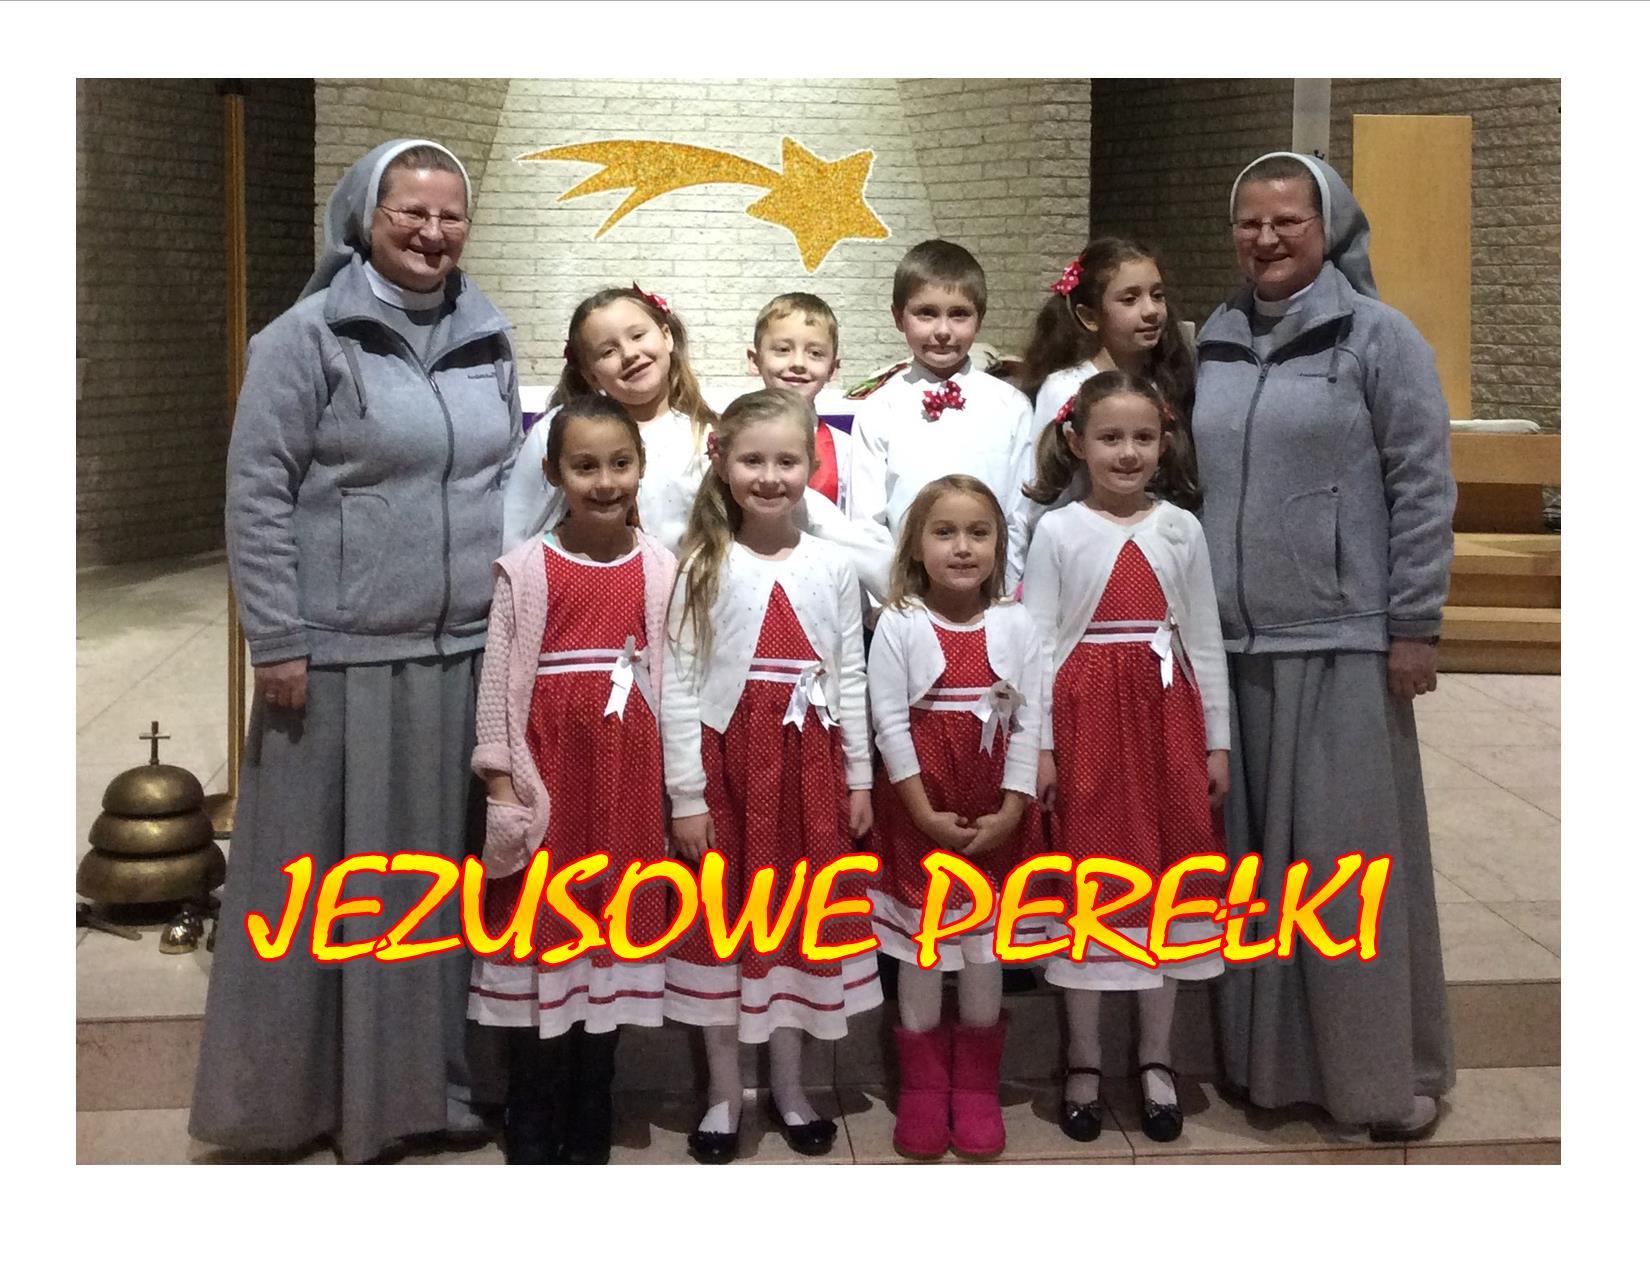 jezusowe-perelki-pictures